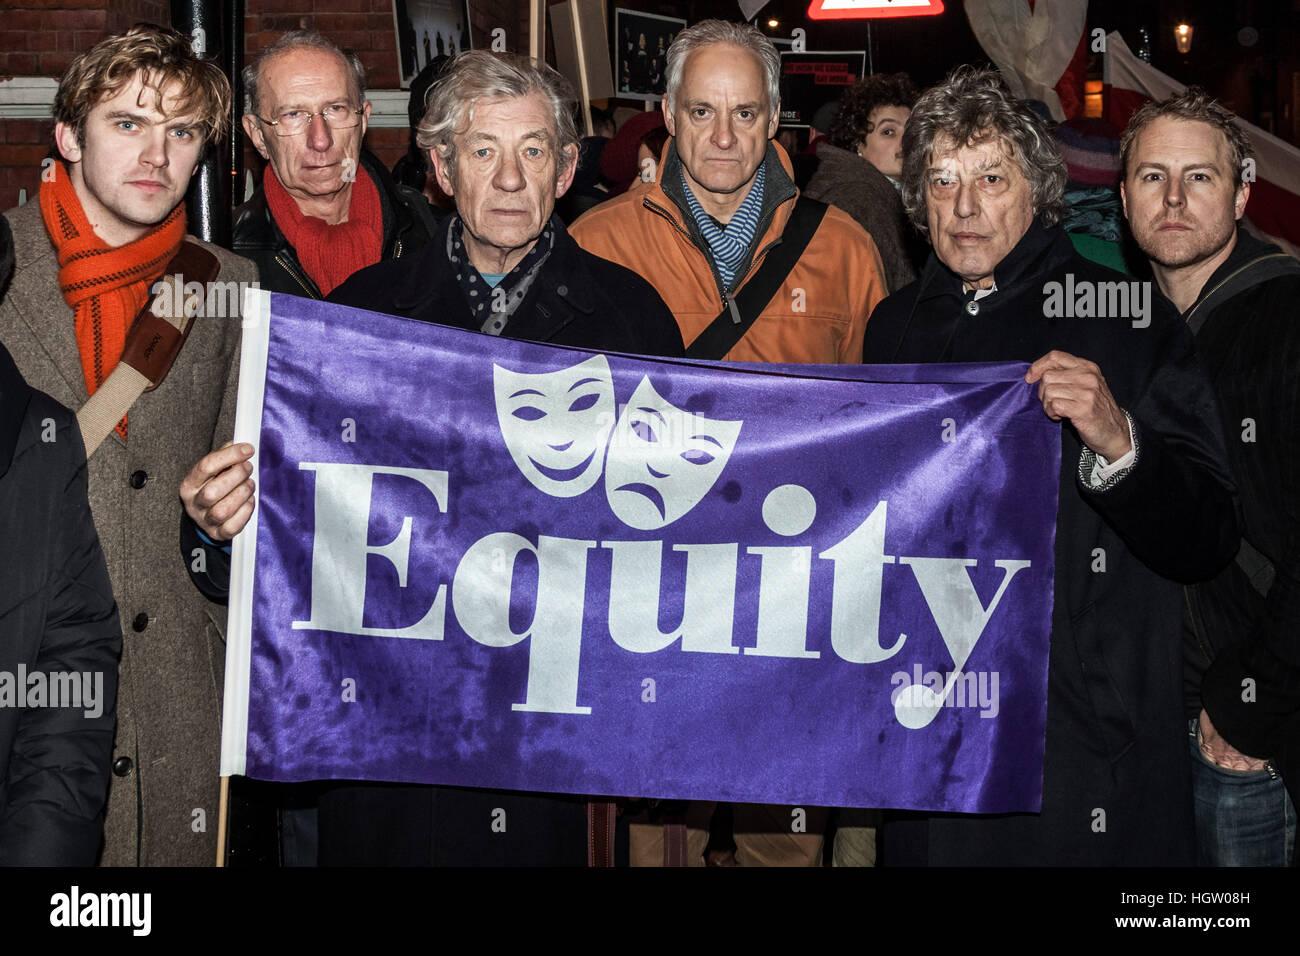 Equity members (L-R) Dan Stevens, Martin Sherman, Ian McKellen, Malcolm Sinclair, Tom Stoppard and Samuel West join - Stock Image